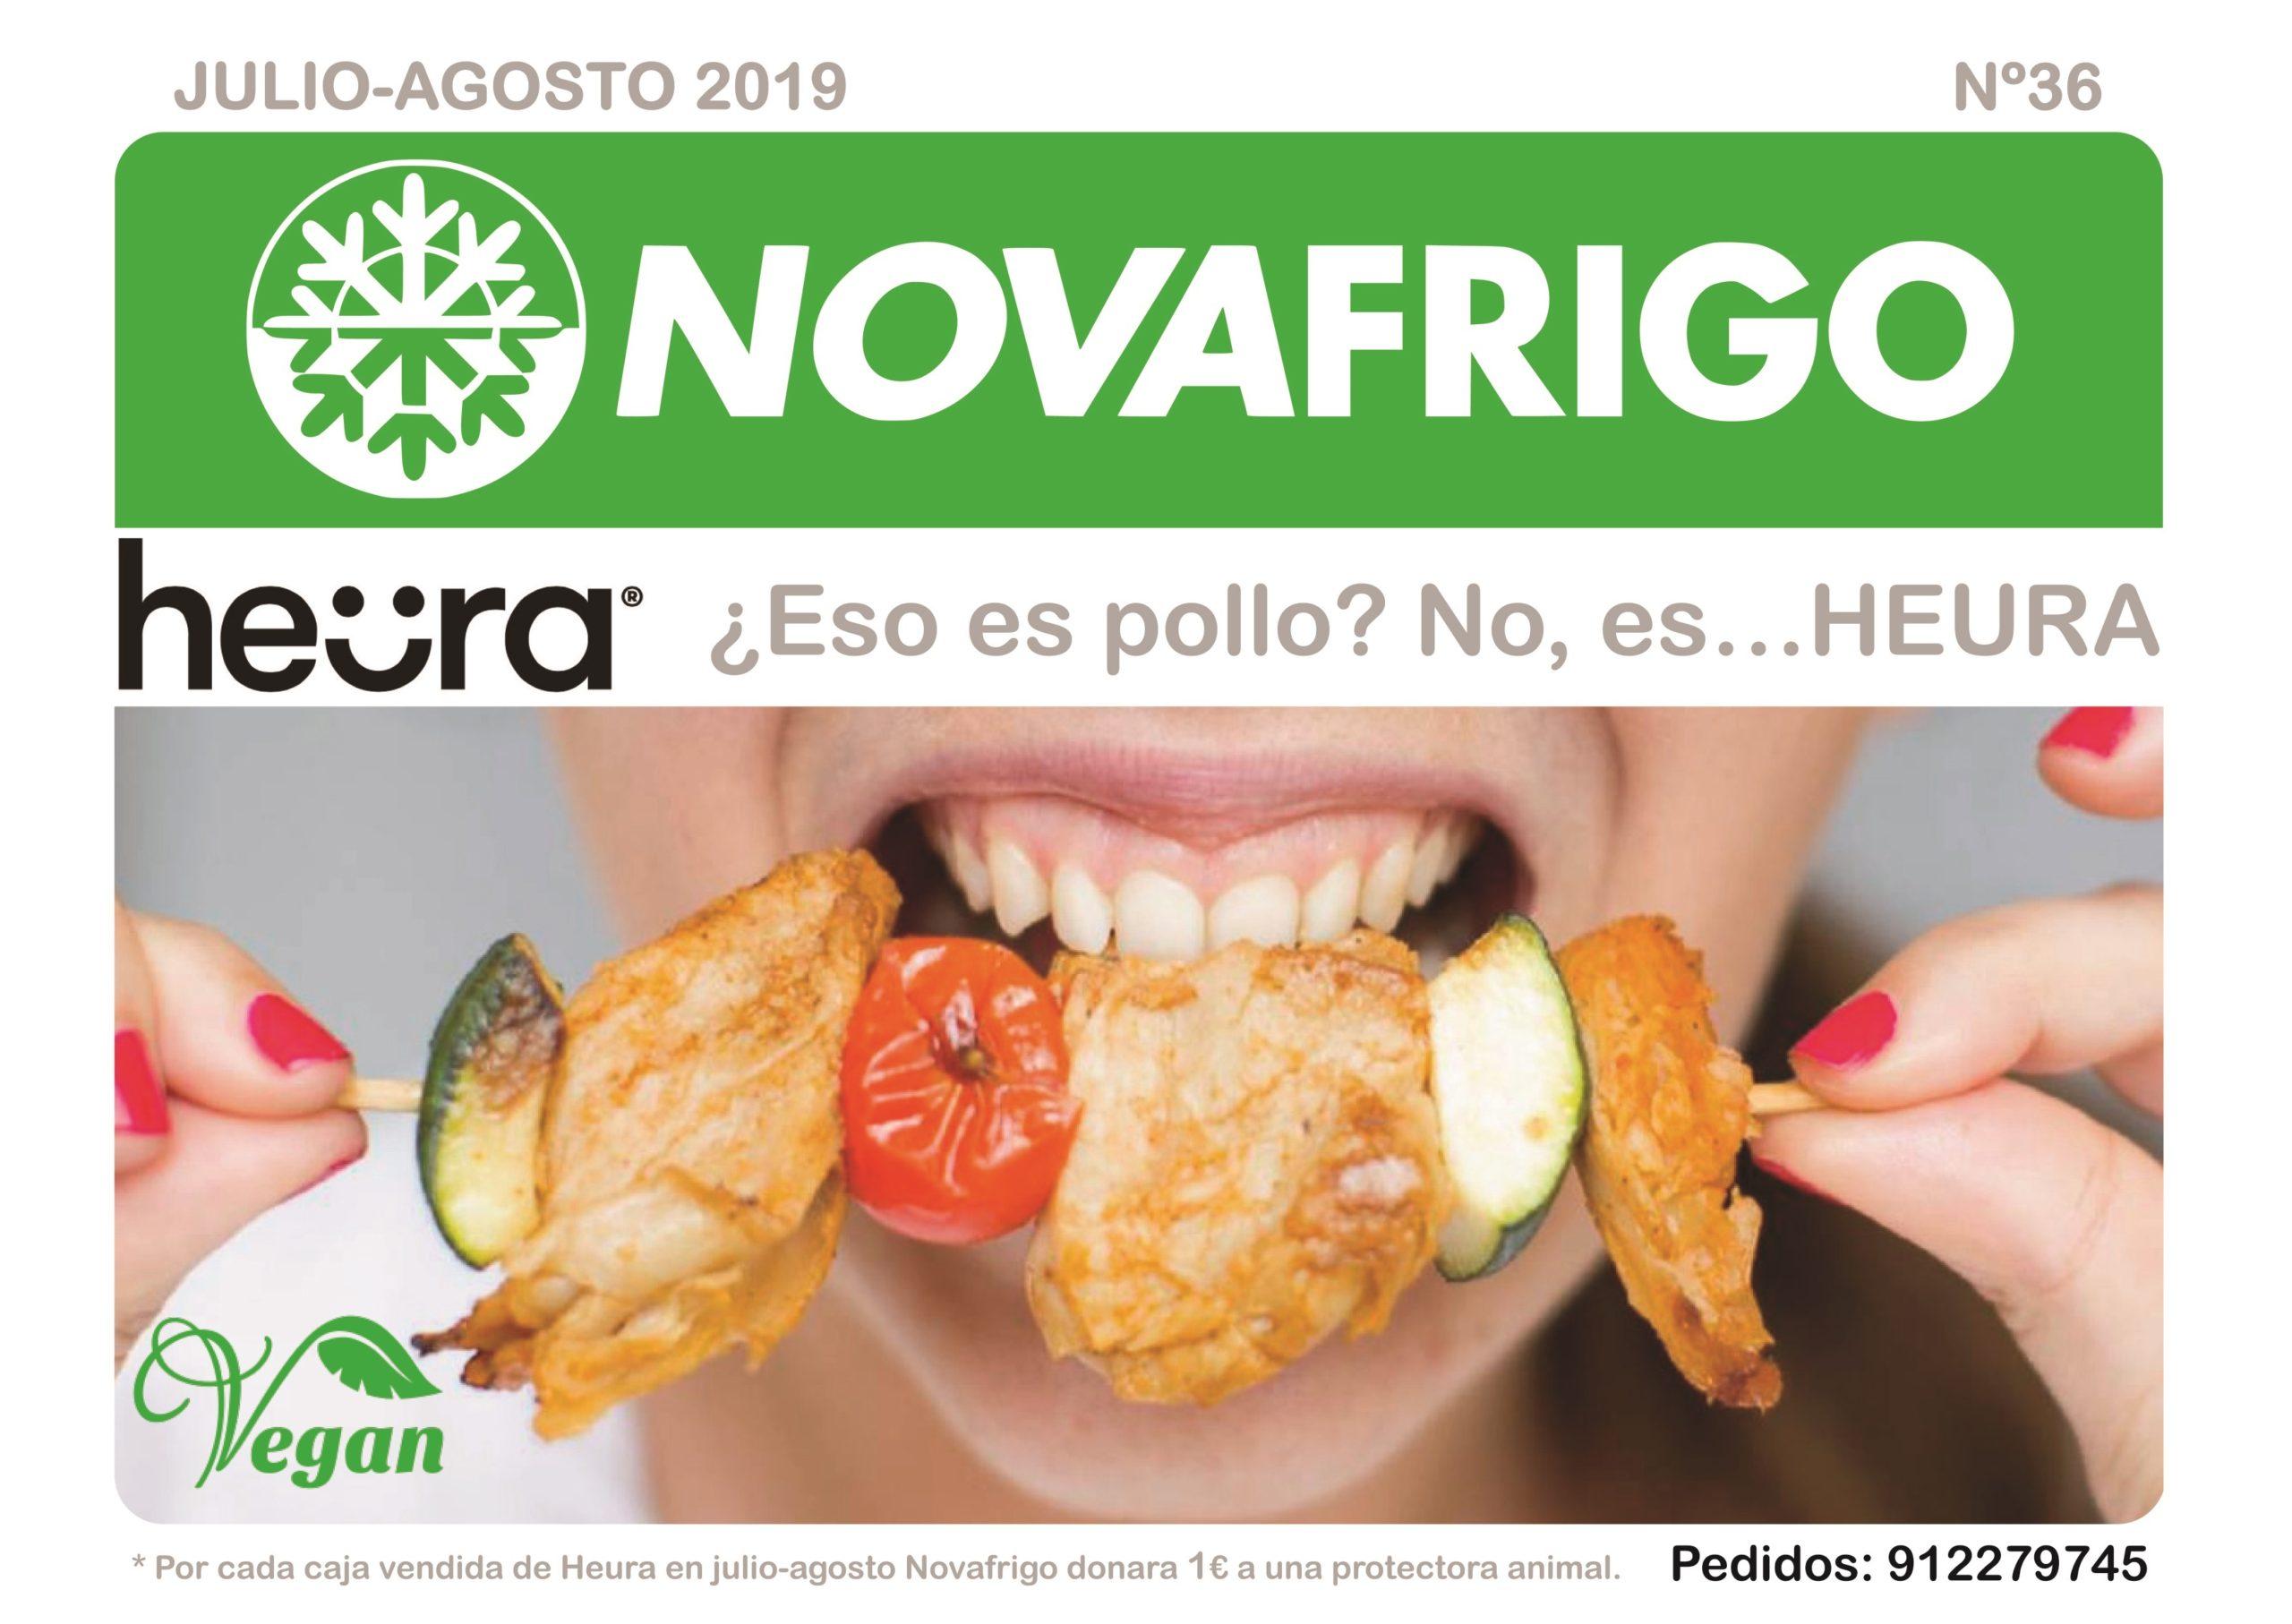 Catálogo comercial Novafrigo julio-agosto 2019